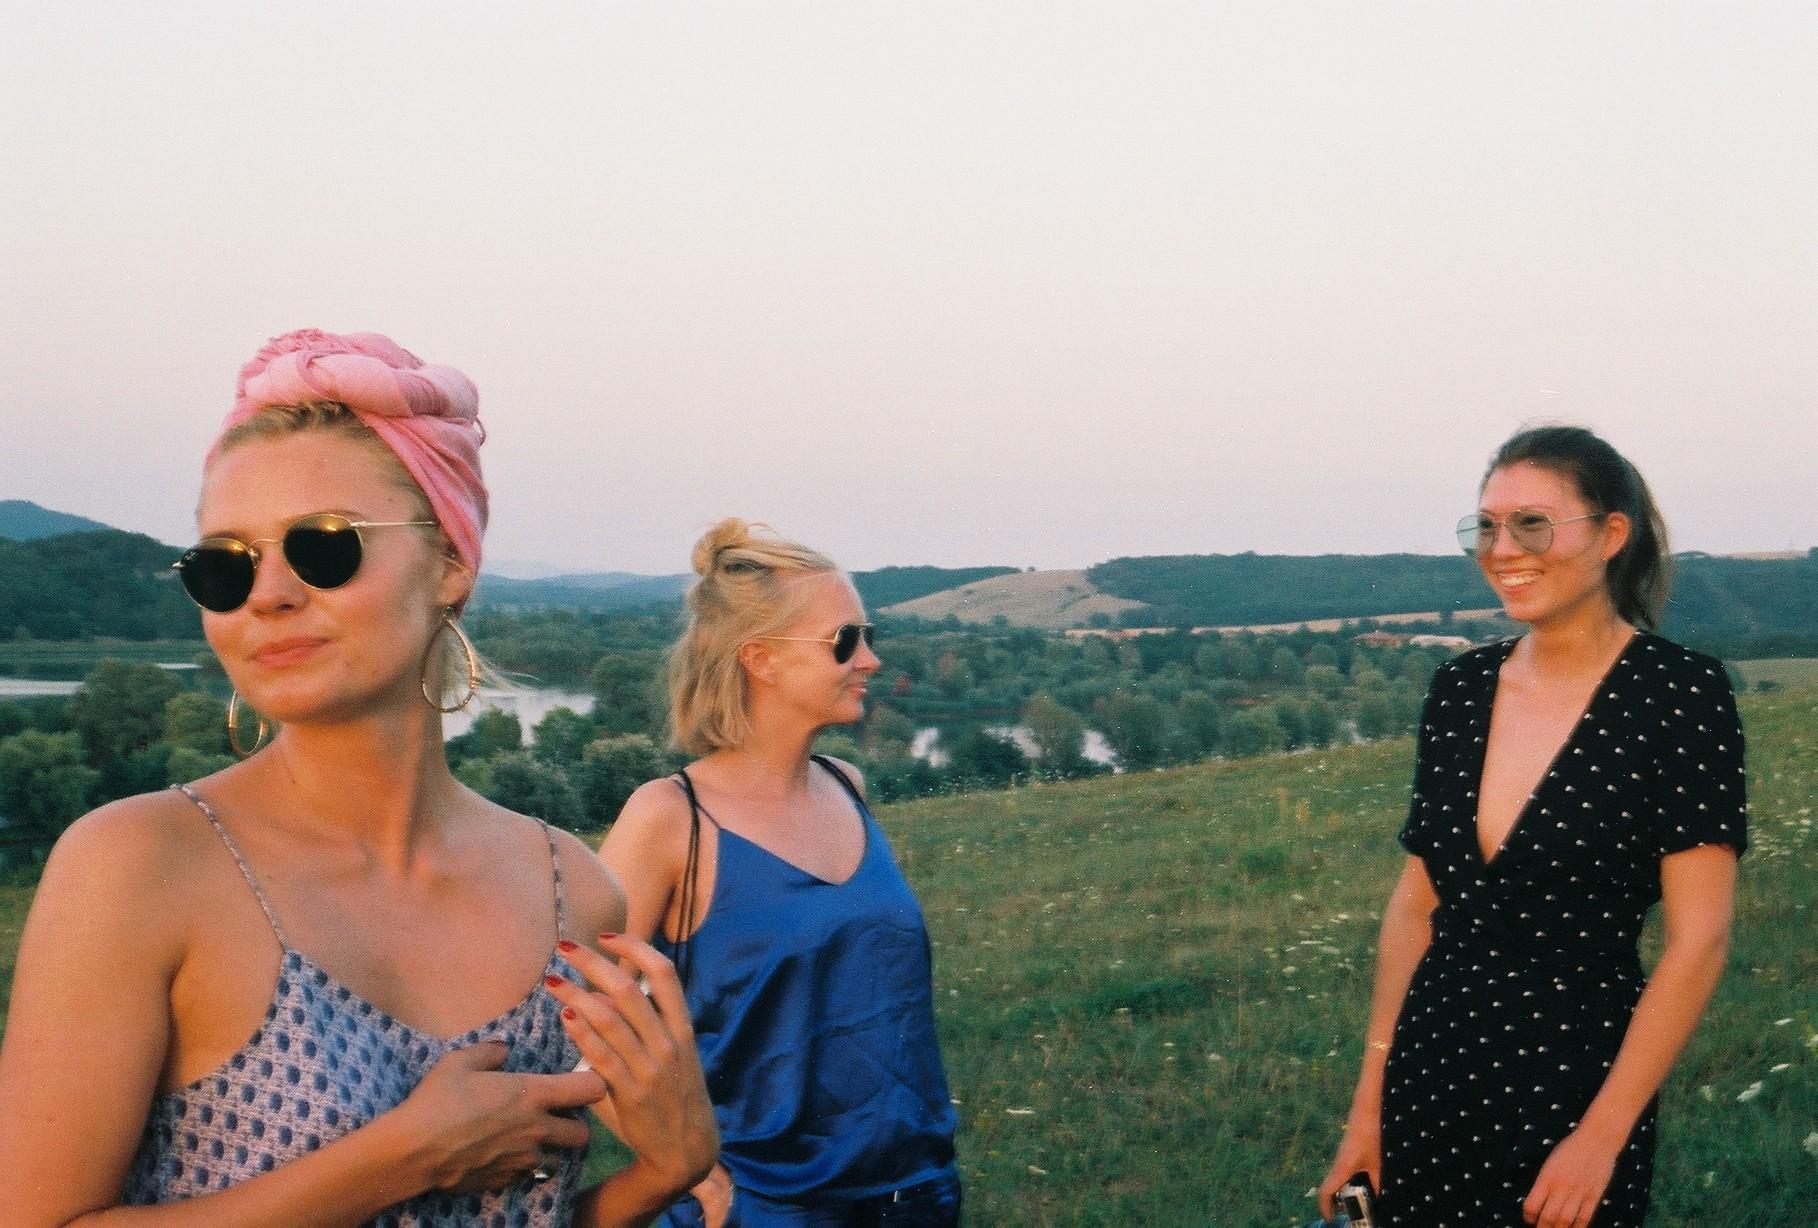 Hungary, Natalie Kocsis